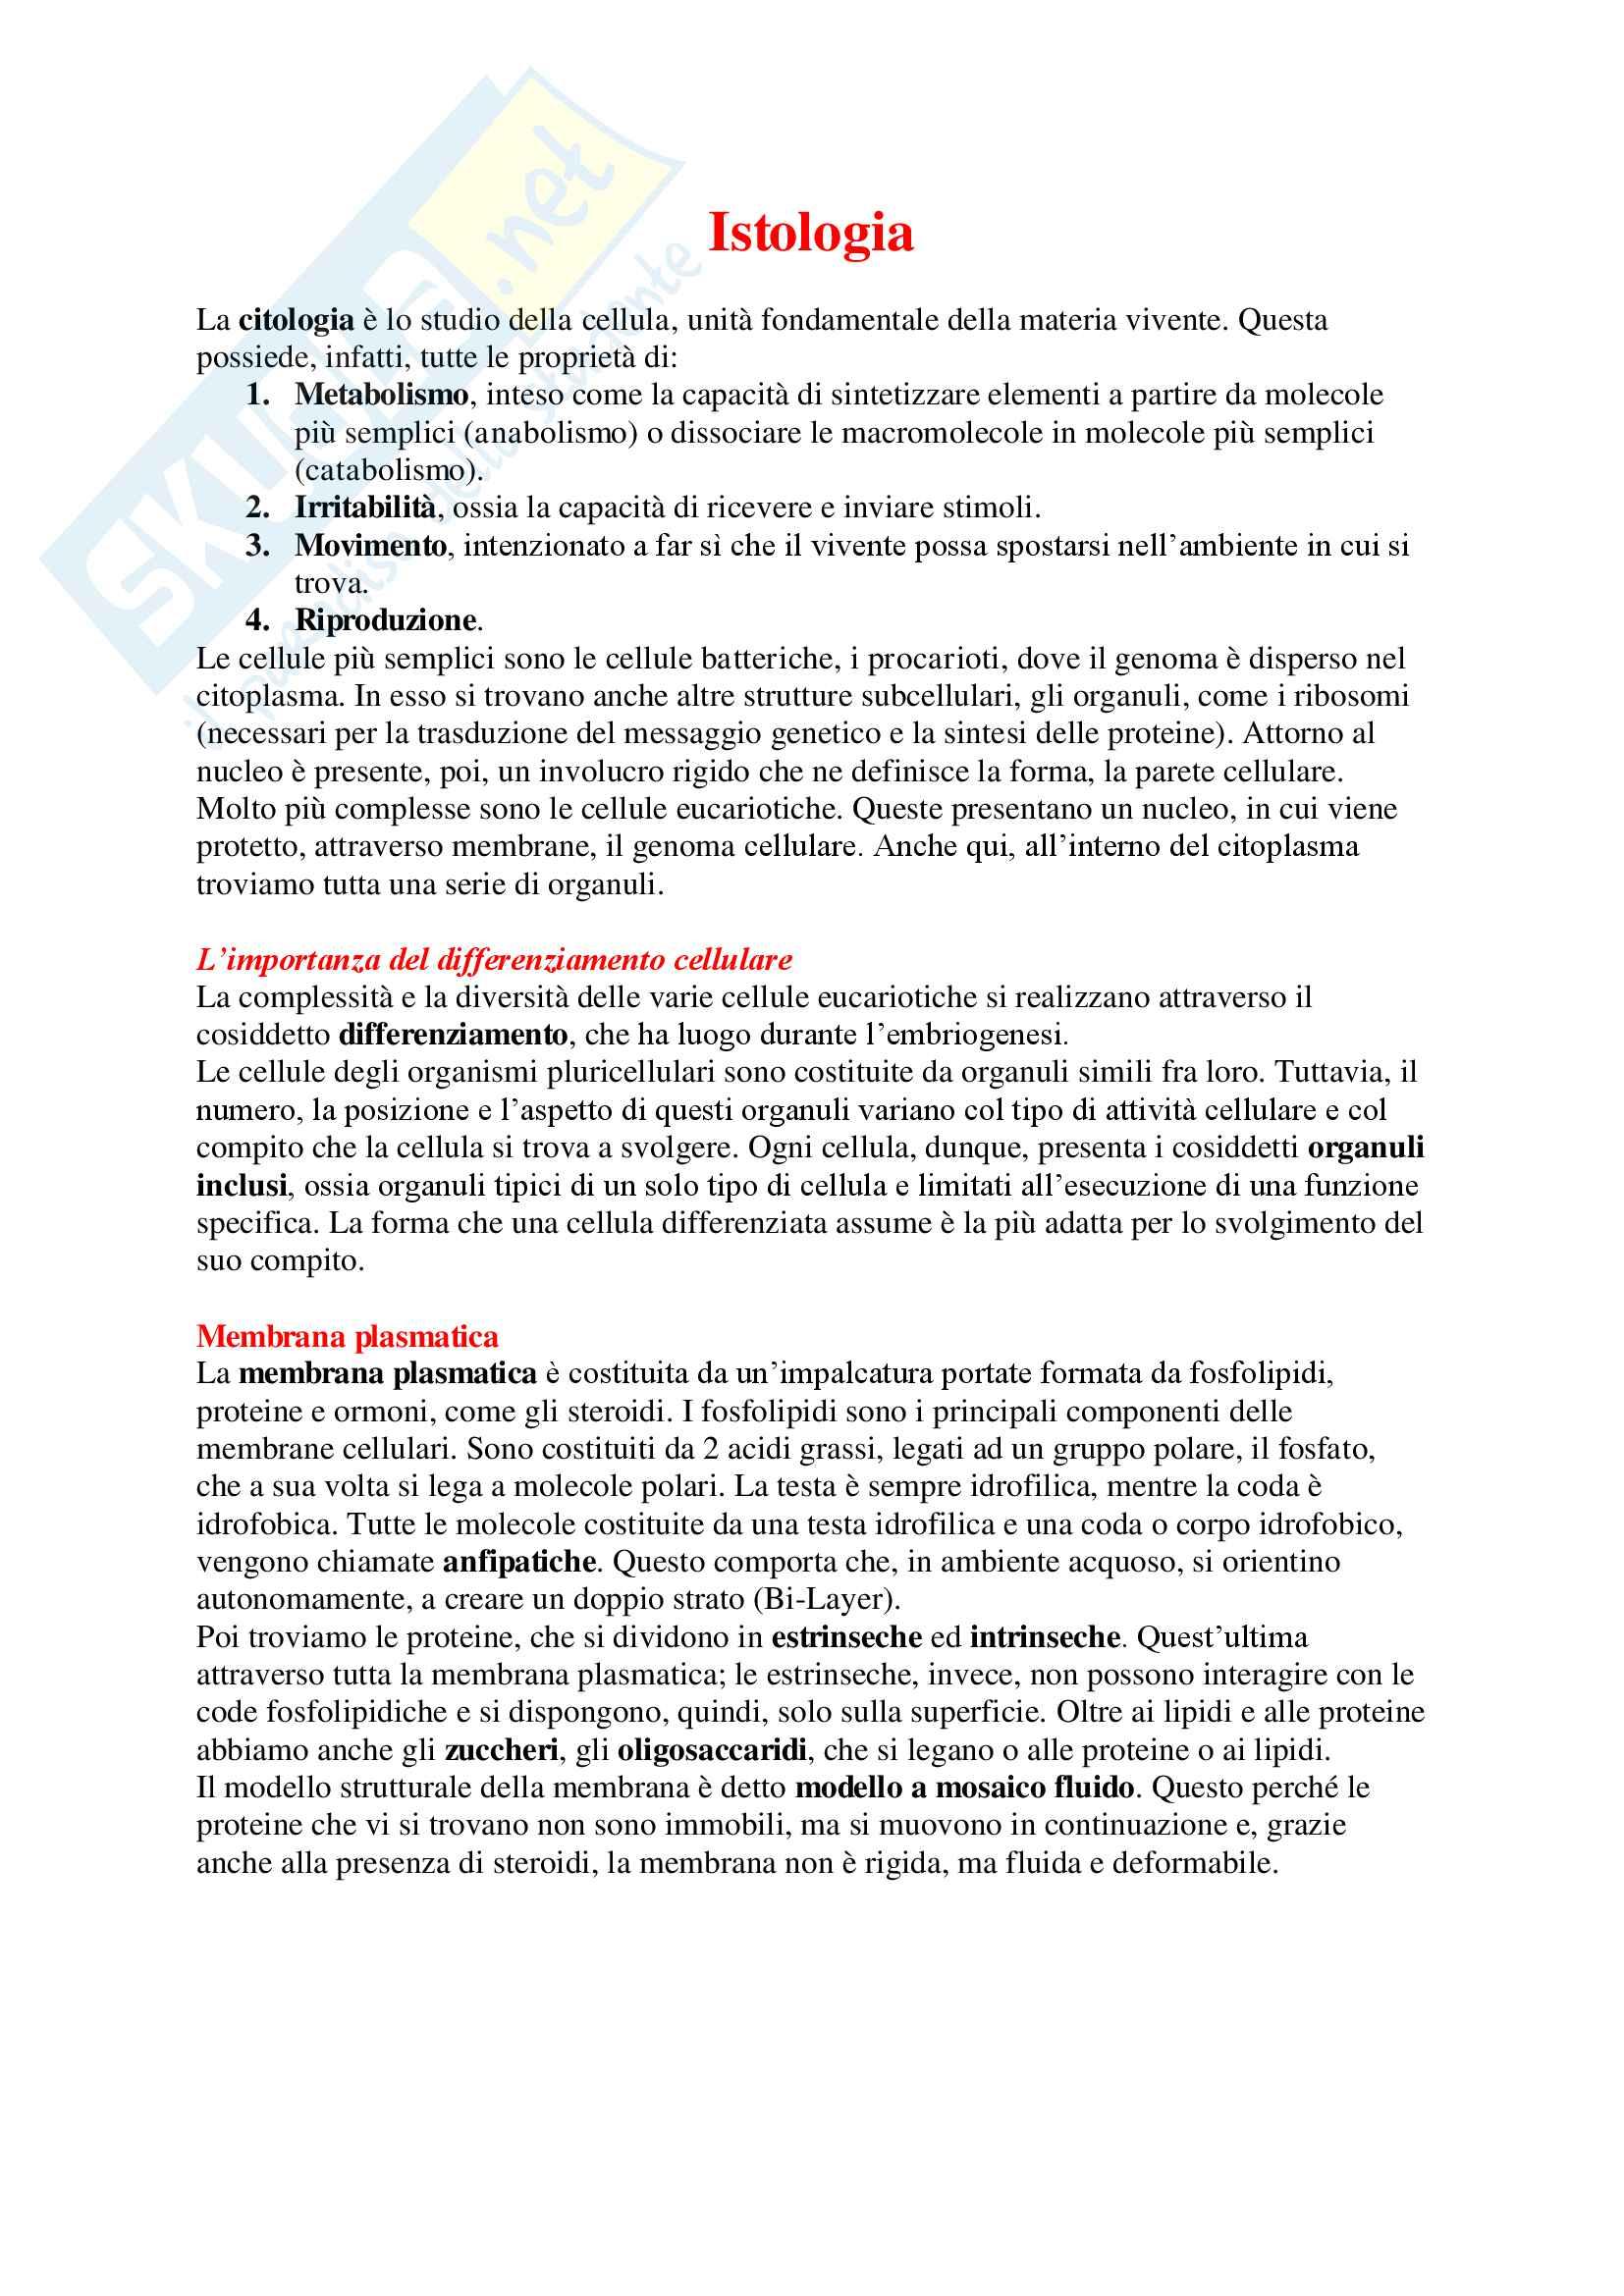 Istologia - Appunti Completi